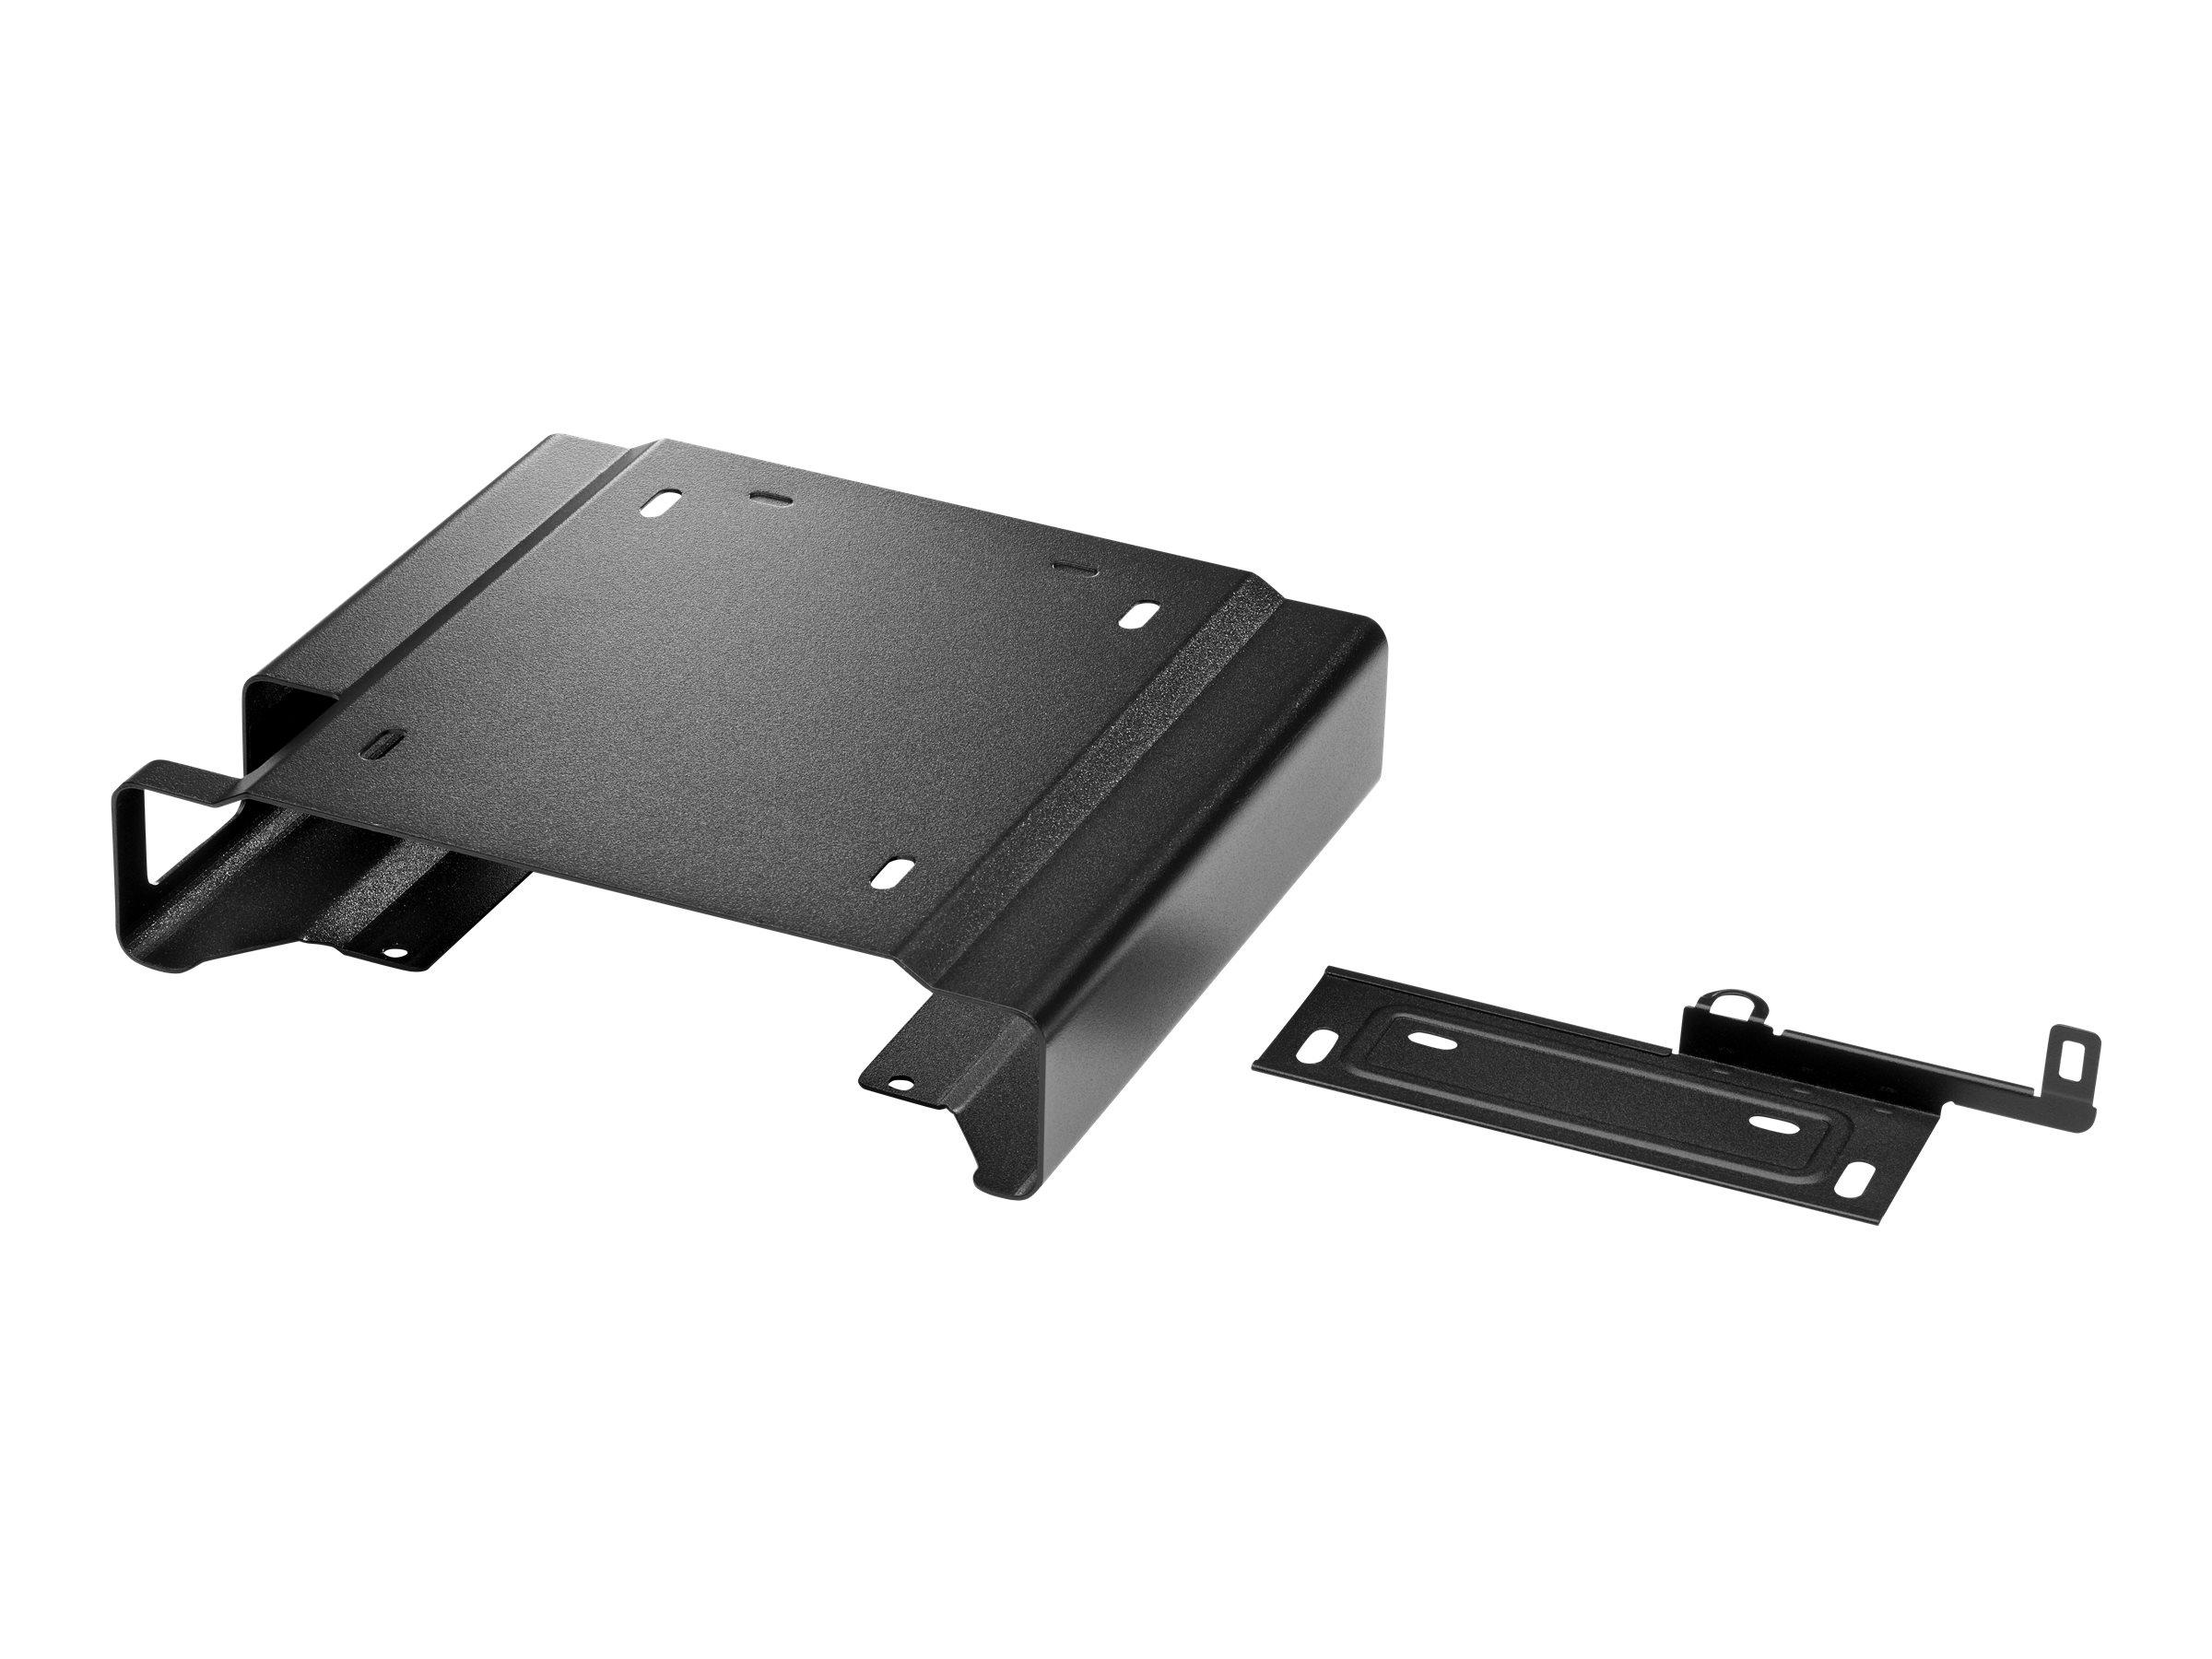 HP Desktop Mini Security / Dual VESA Sleeve v2 - Desktop-Hülle - für HP 260 G3; EliteDesk 705 G2, 705 G3; ProDesk 400 G1, 400 G3